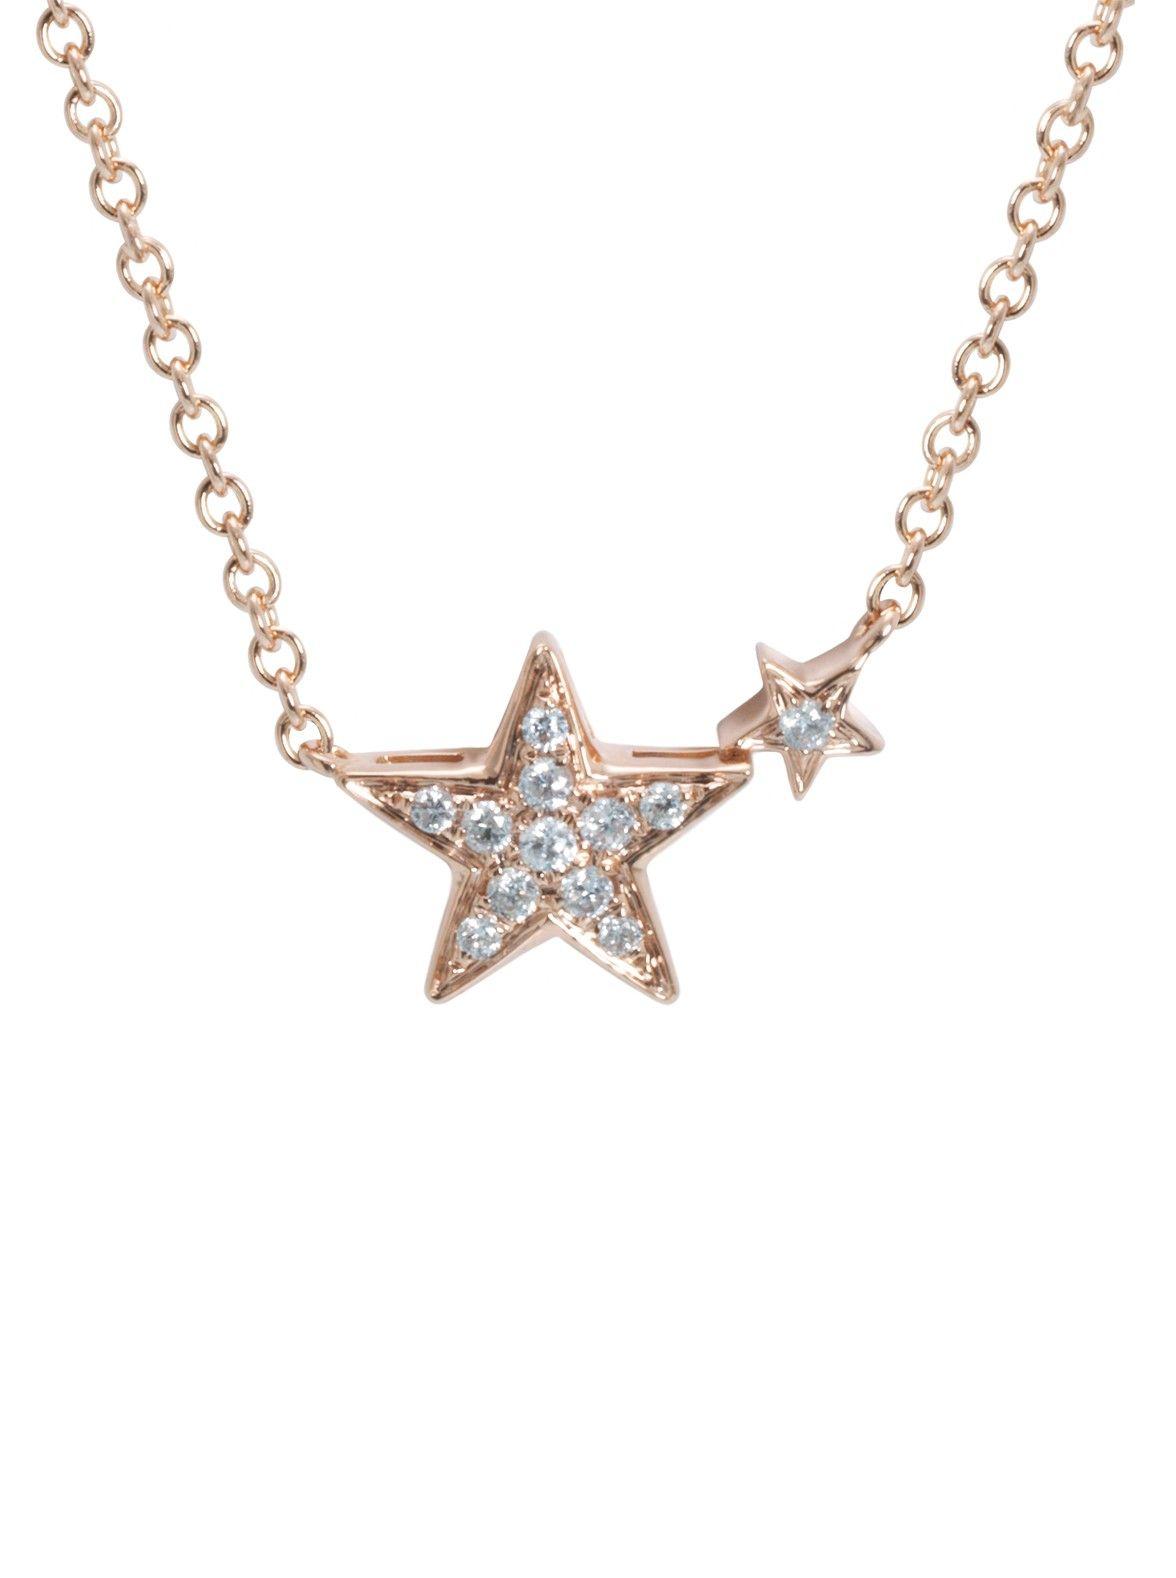 Djula joaillerie 18k rose gold and diamond star pendant necklace at djula joaillerie 18k rose gold and diamond star pendant necklace at london jewelers aloadofball Gallery